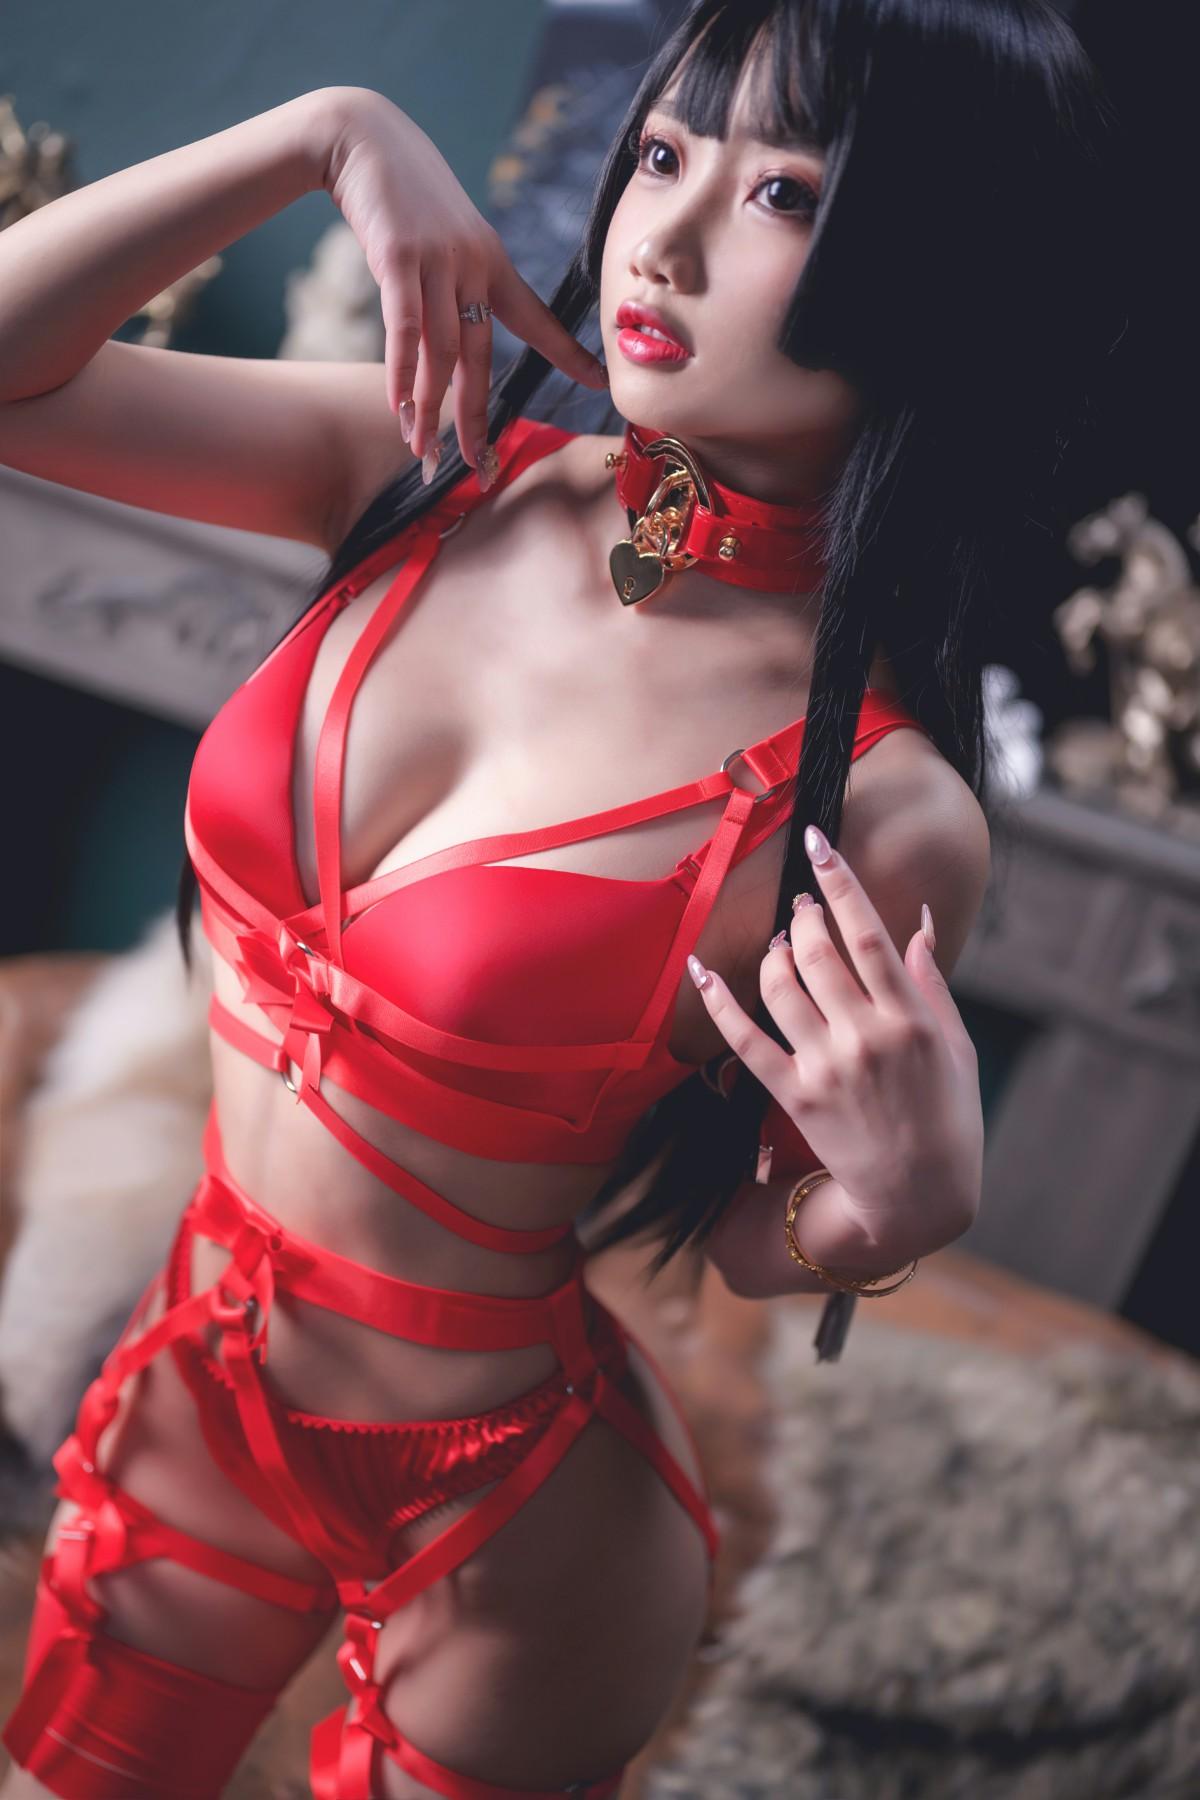 [Cosplay]鬼畜瑶 - 红色束缚 第1张